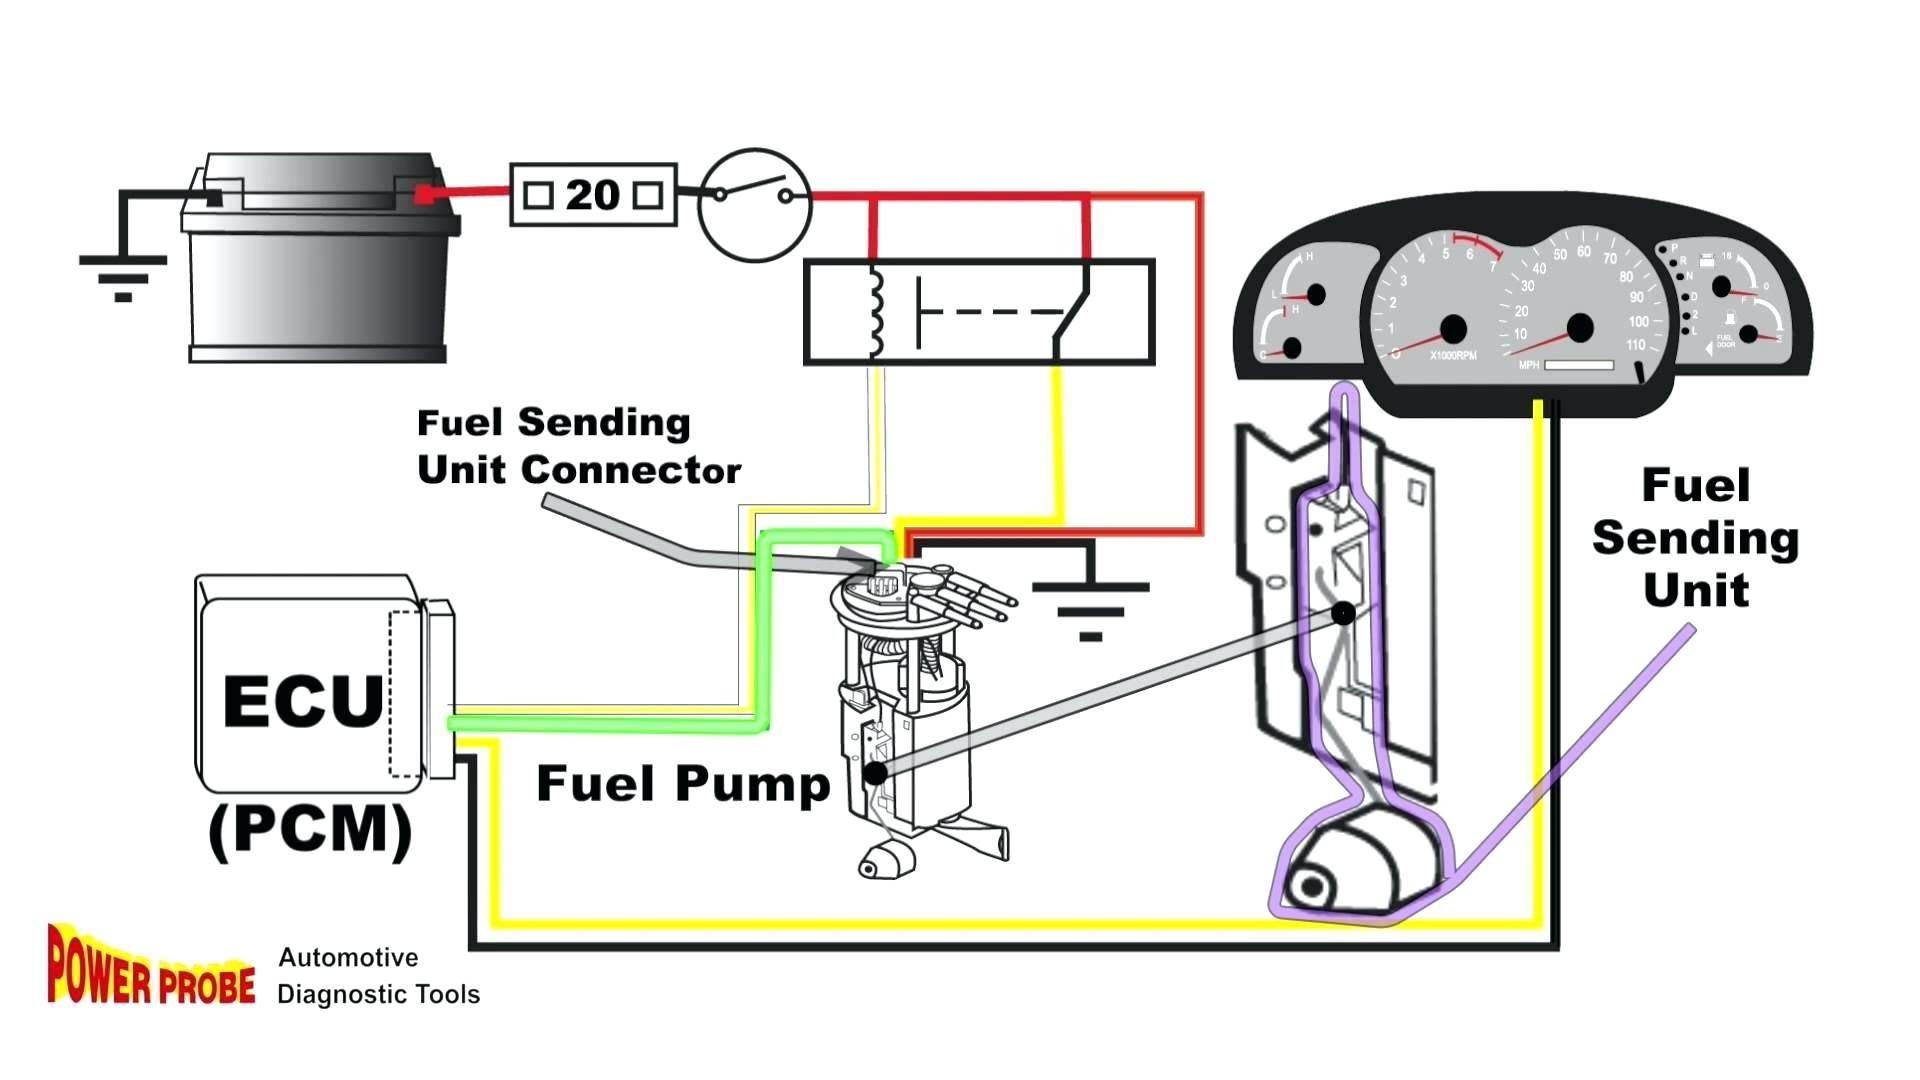 Peterbilt Fuel Gauge Wiring Diagram | Wiring Diagram - Gm Fuel Sending Unit Wiring Diagram